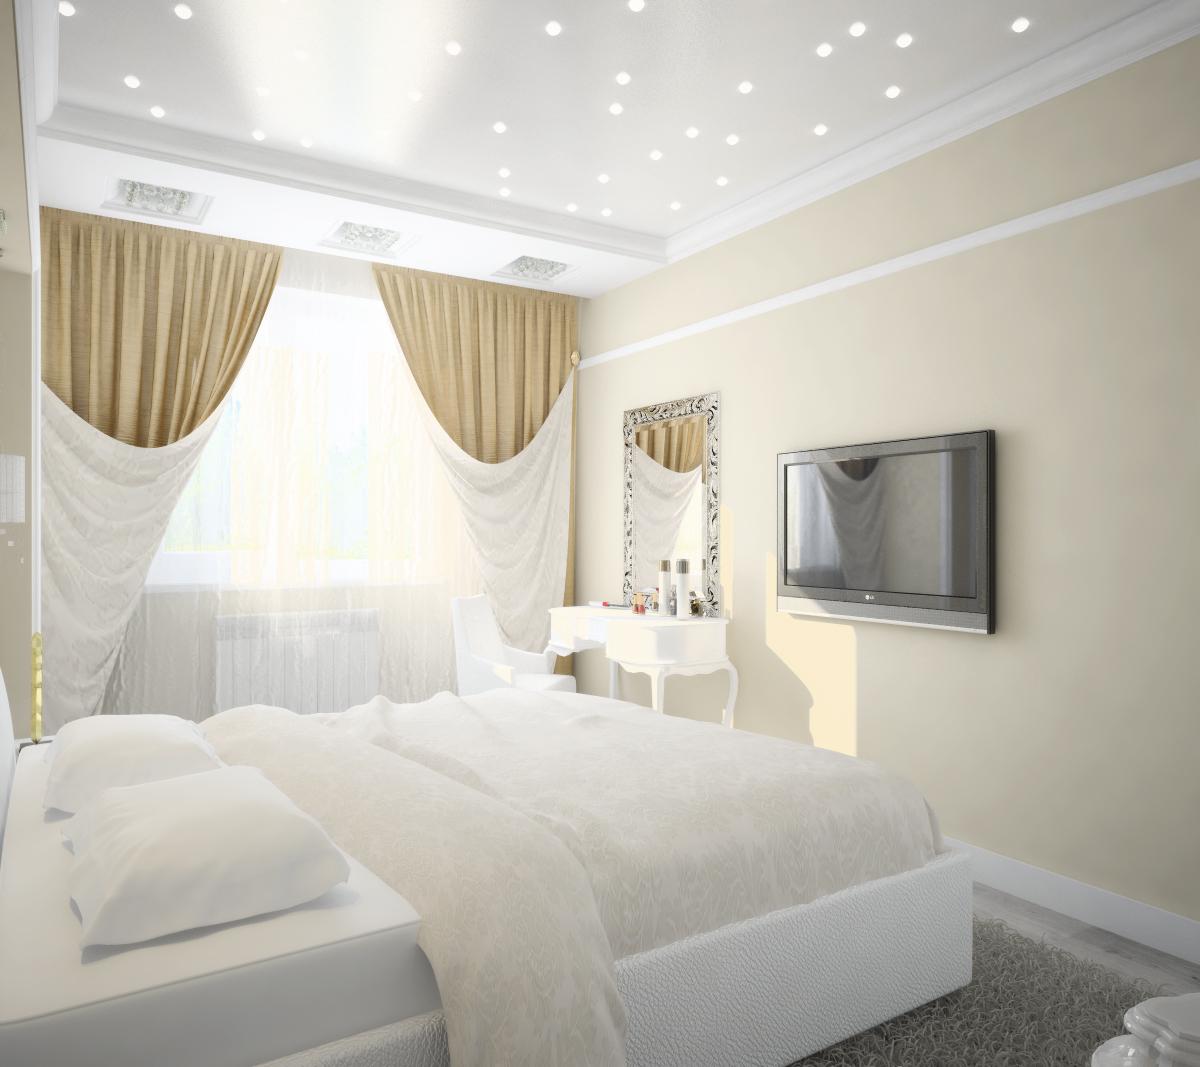 http://sam-sebe-dizainer.com/public/images/Фото спальни 5 на 5 в светлой цветовой гамме